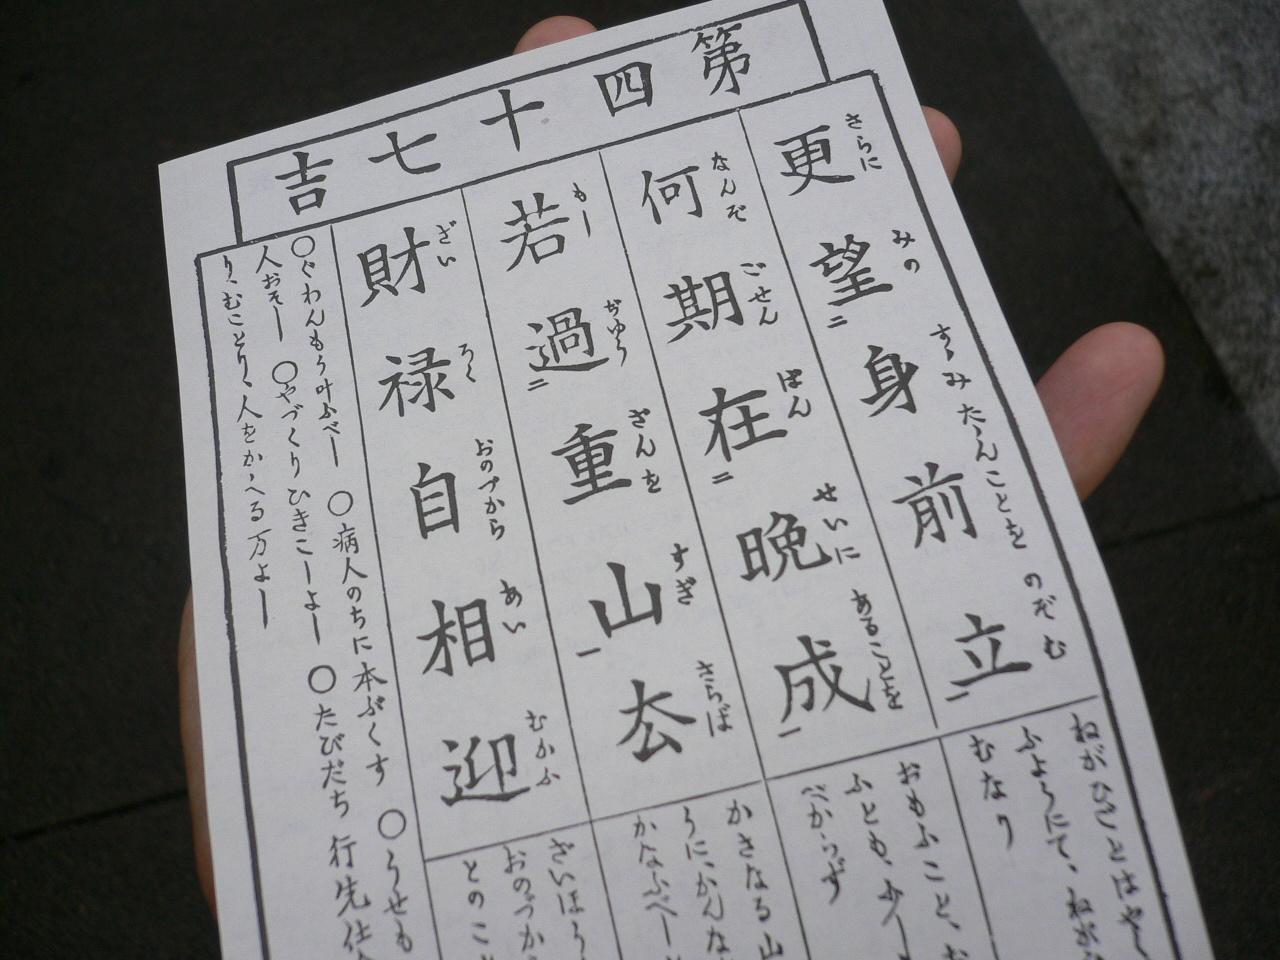 Omikuji_by_hirotomo_in_Asakusa,_Tokyo